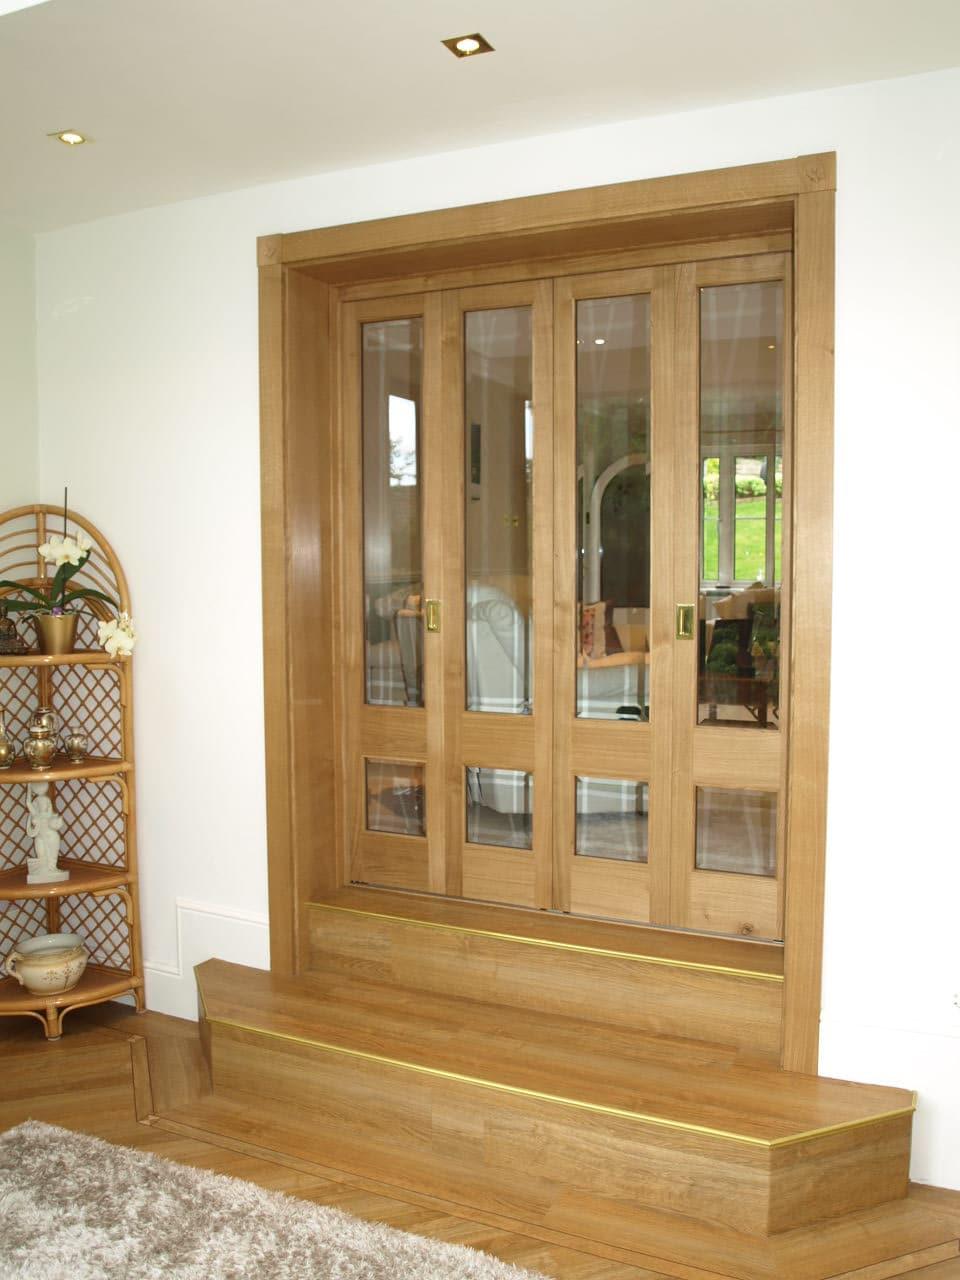 Solid Oak Room Dividing Bifold Doors